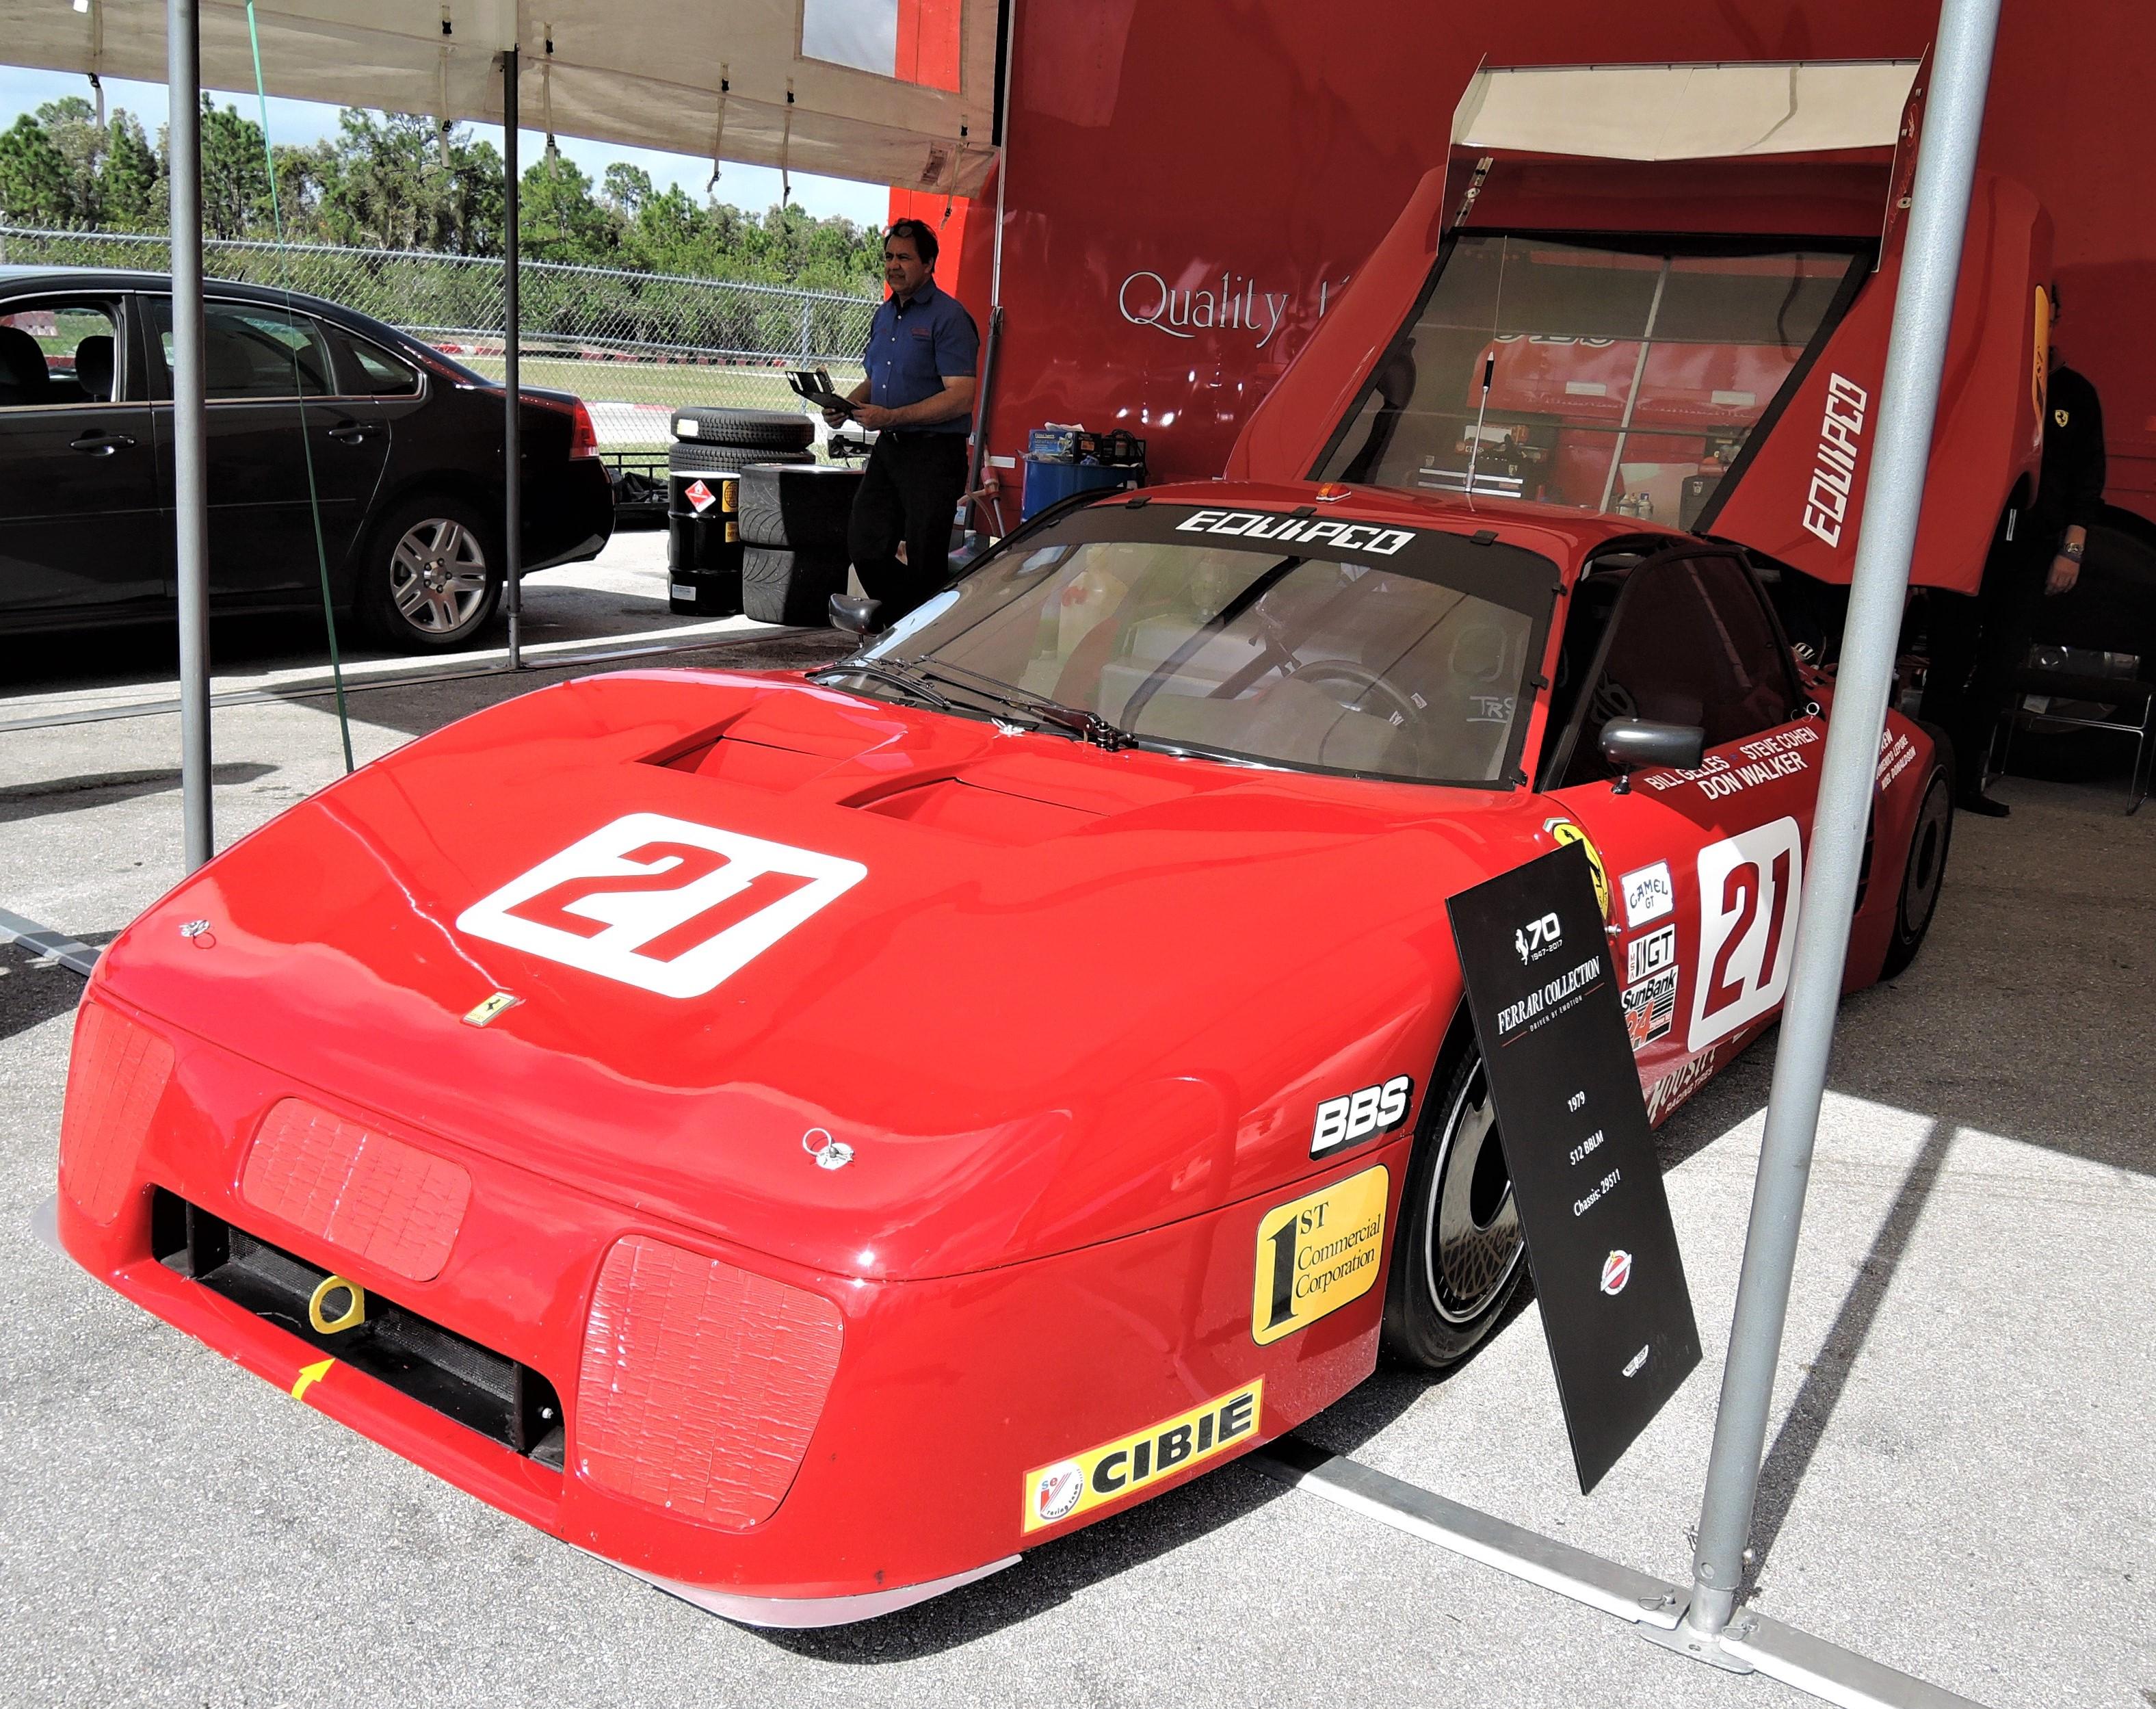 red Ferrari 512 BBLM Sn 29511 - PBIR - cavallino 2018